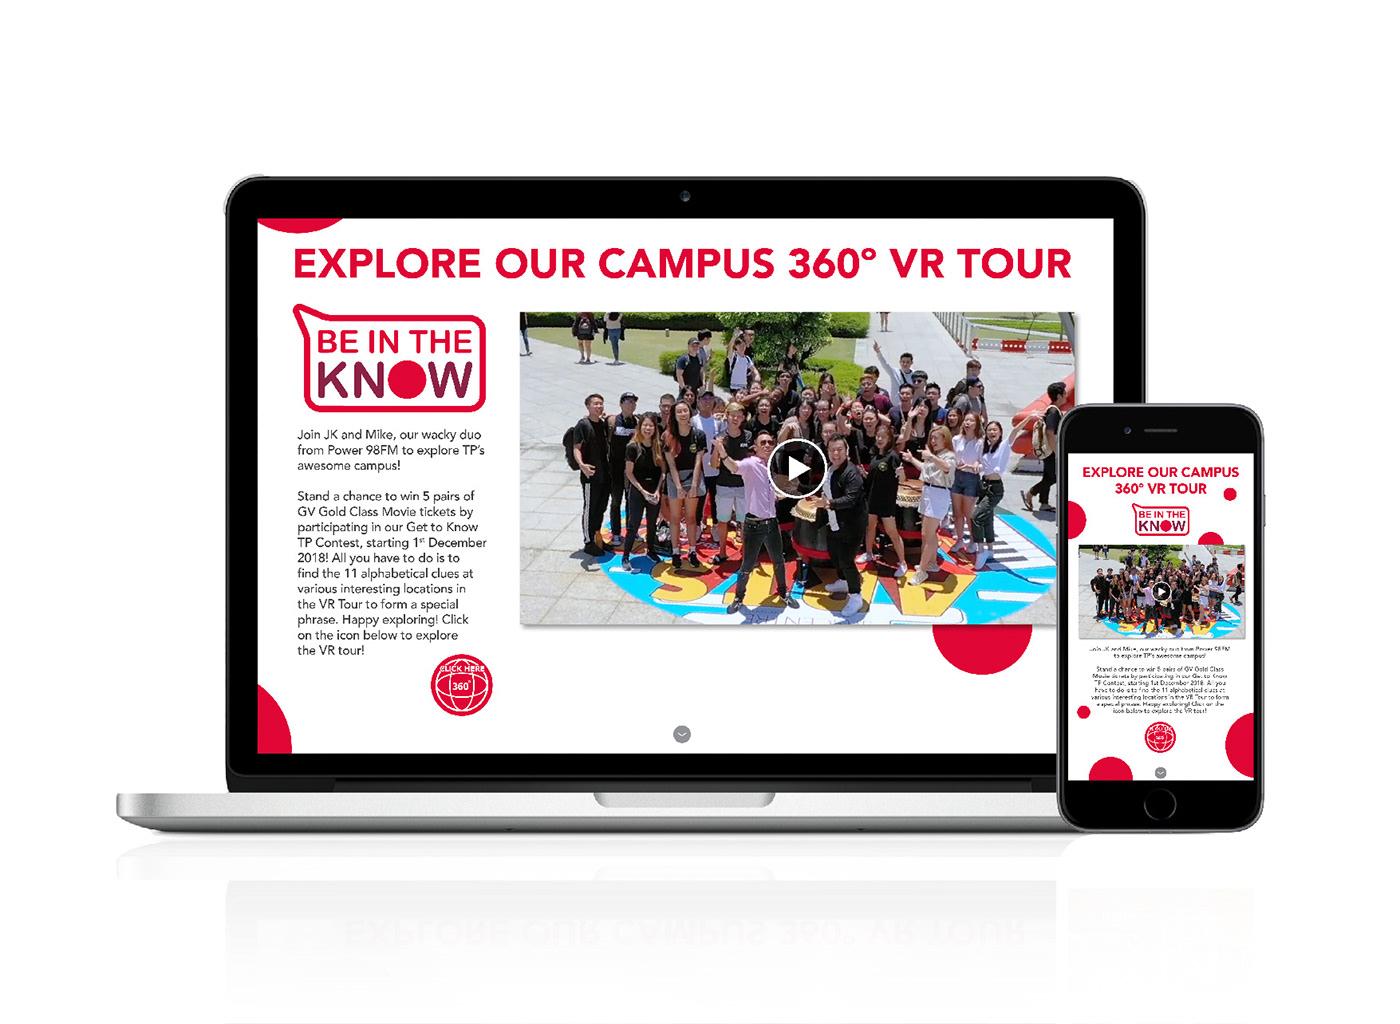 Education school Polytechnic Socialmedia microsite CreativeDirection beintheknow reachhigher campaign Students